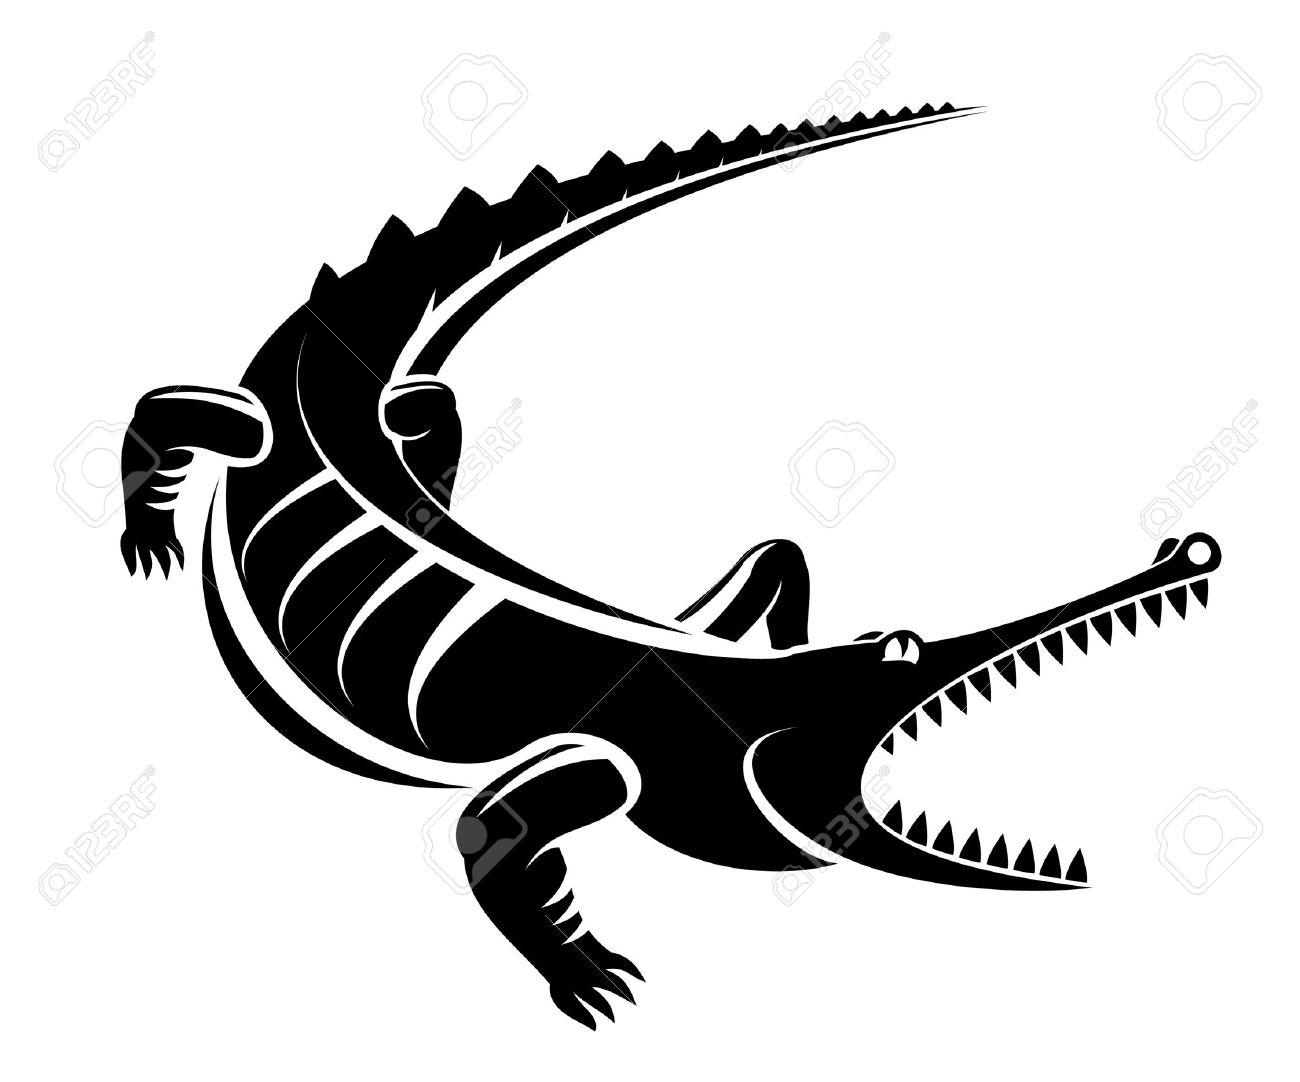 Isolated Shape Of Crocodile As A Mascot Stock Vector